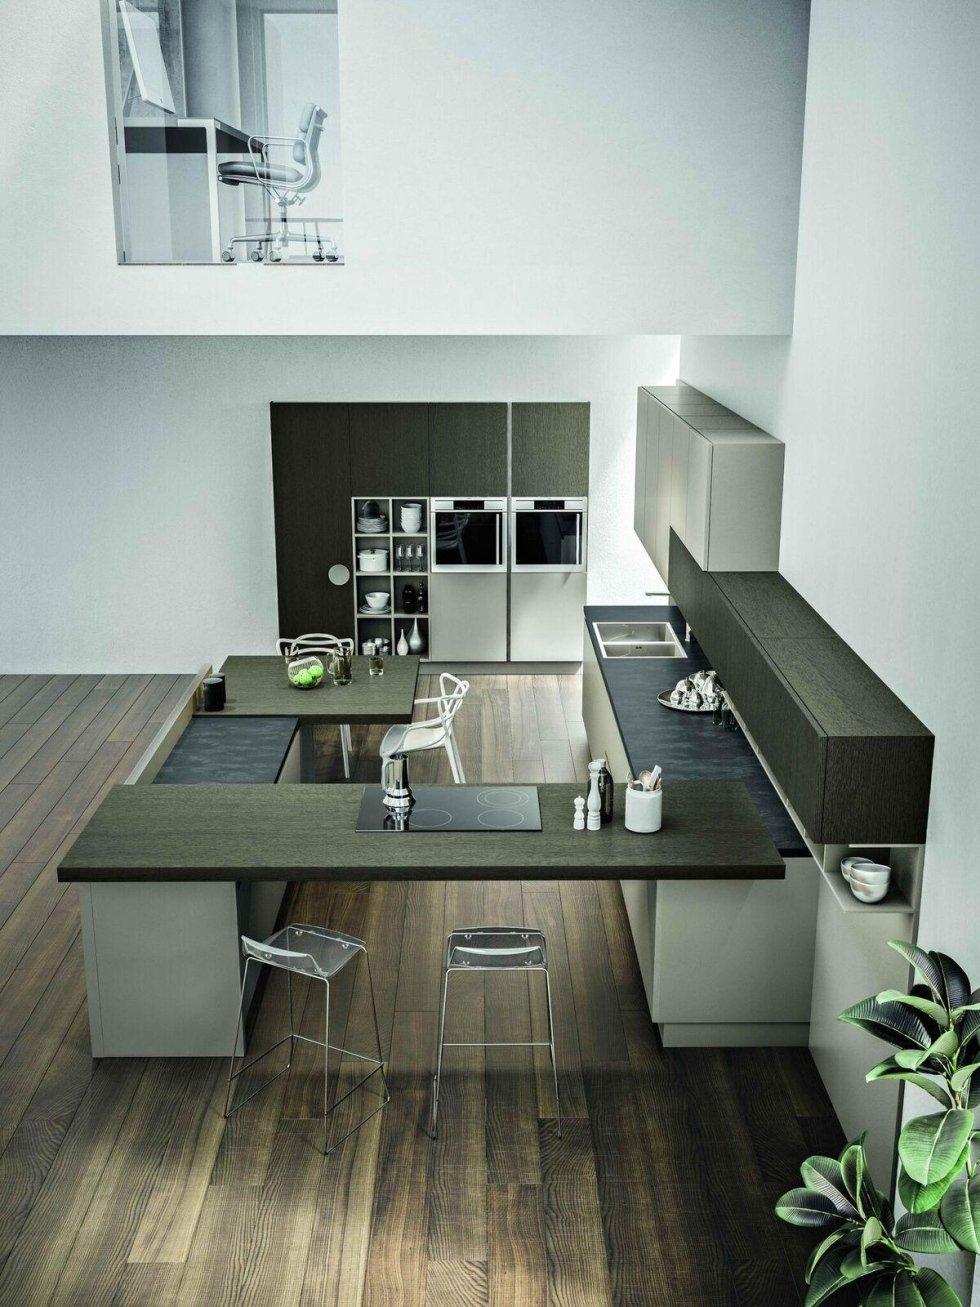 Fornitura cucine moderne giaveno torino mobili for Mobili cucine torino